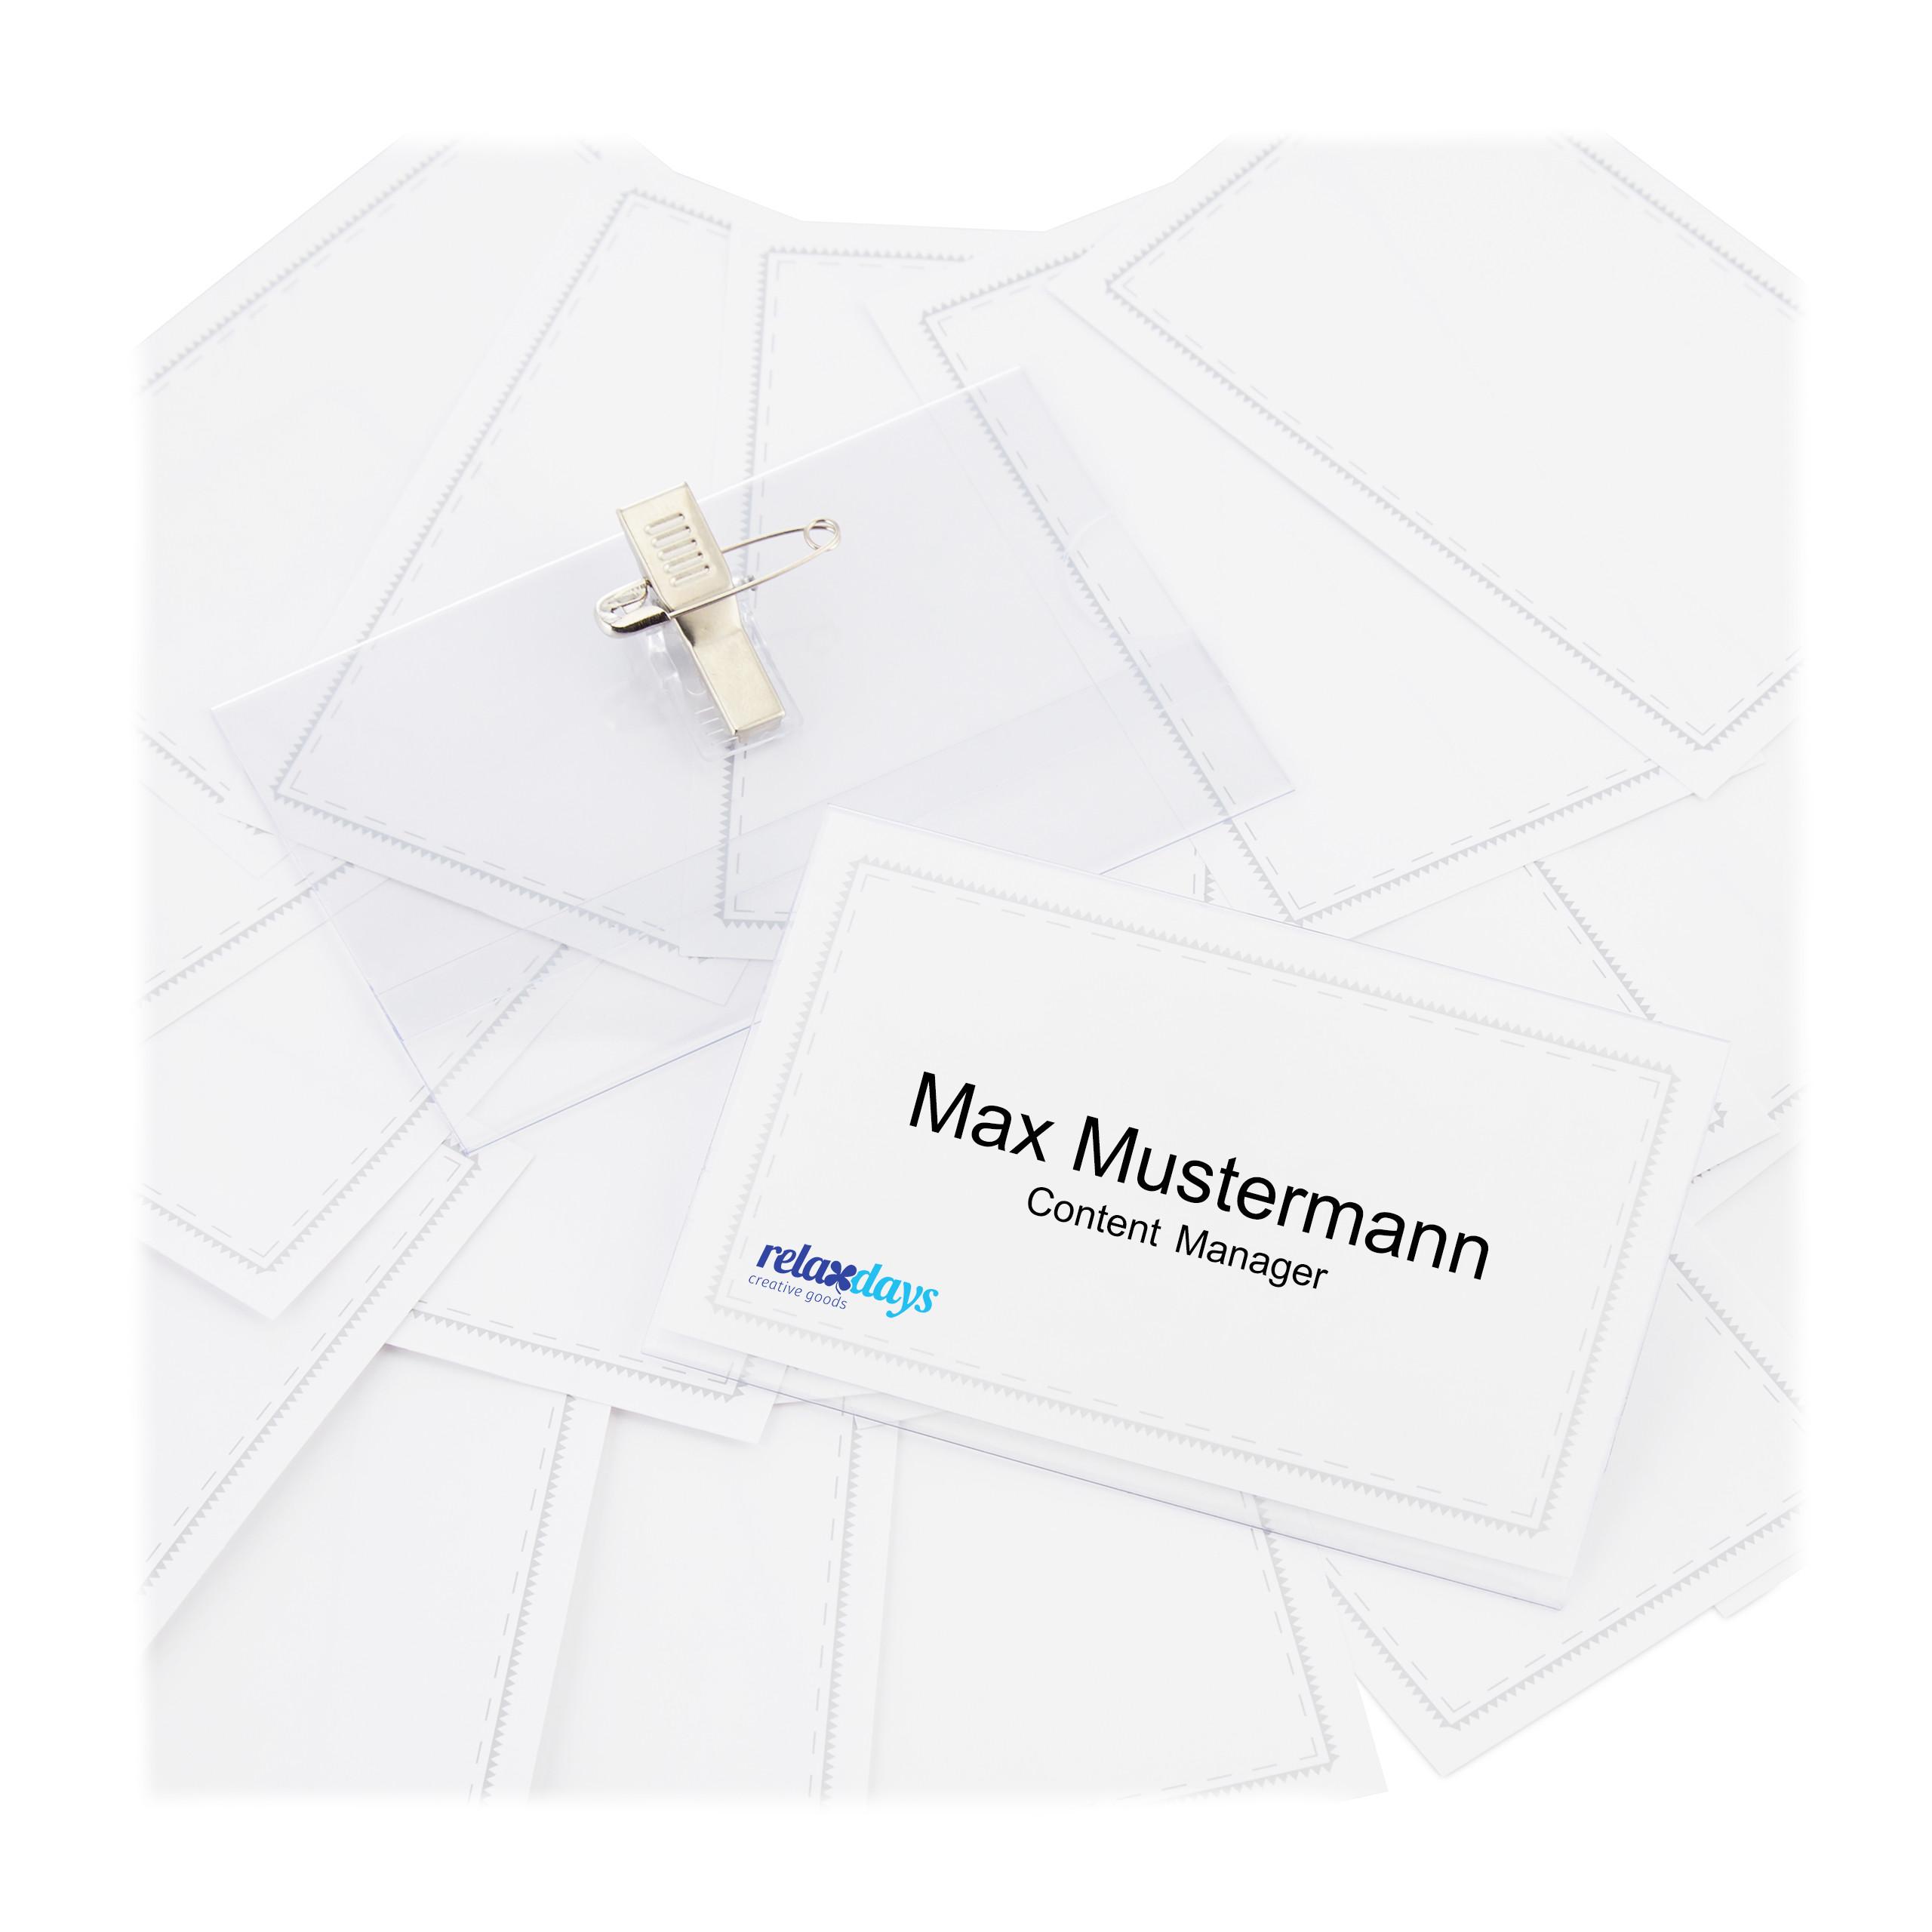 Namensschilder 50er Set PVC Namensschild Kartenhülle Clip Ansteck Namensschild